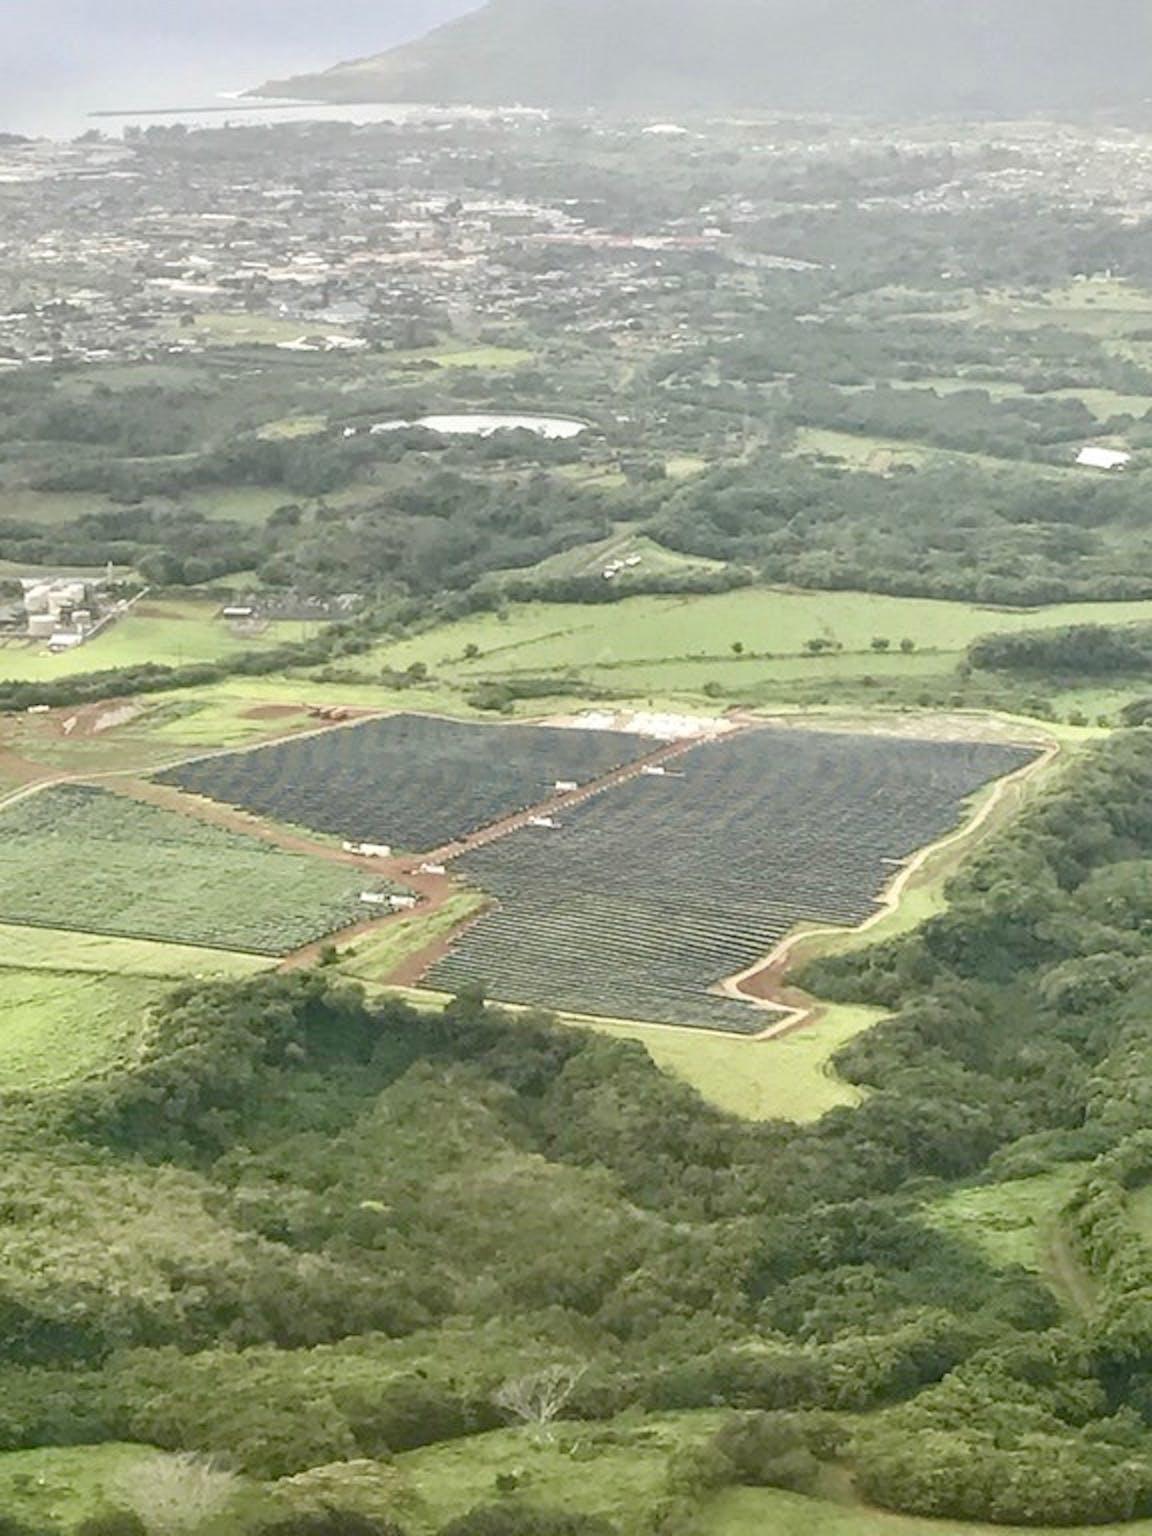 The solar farm nestled in the hills.